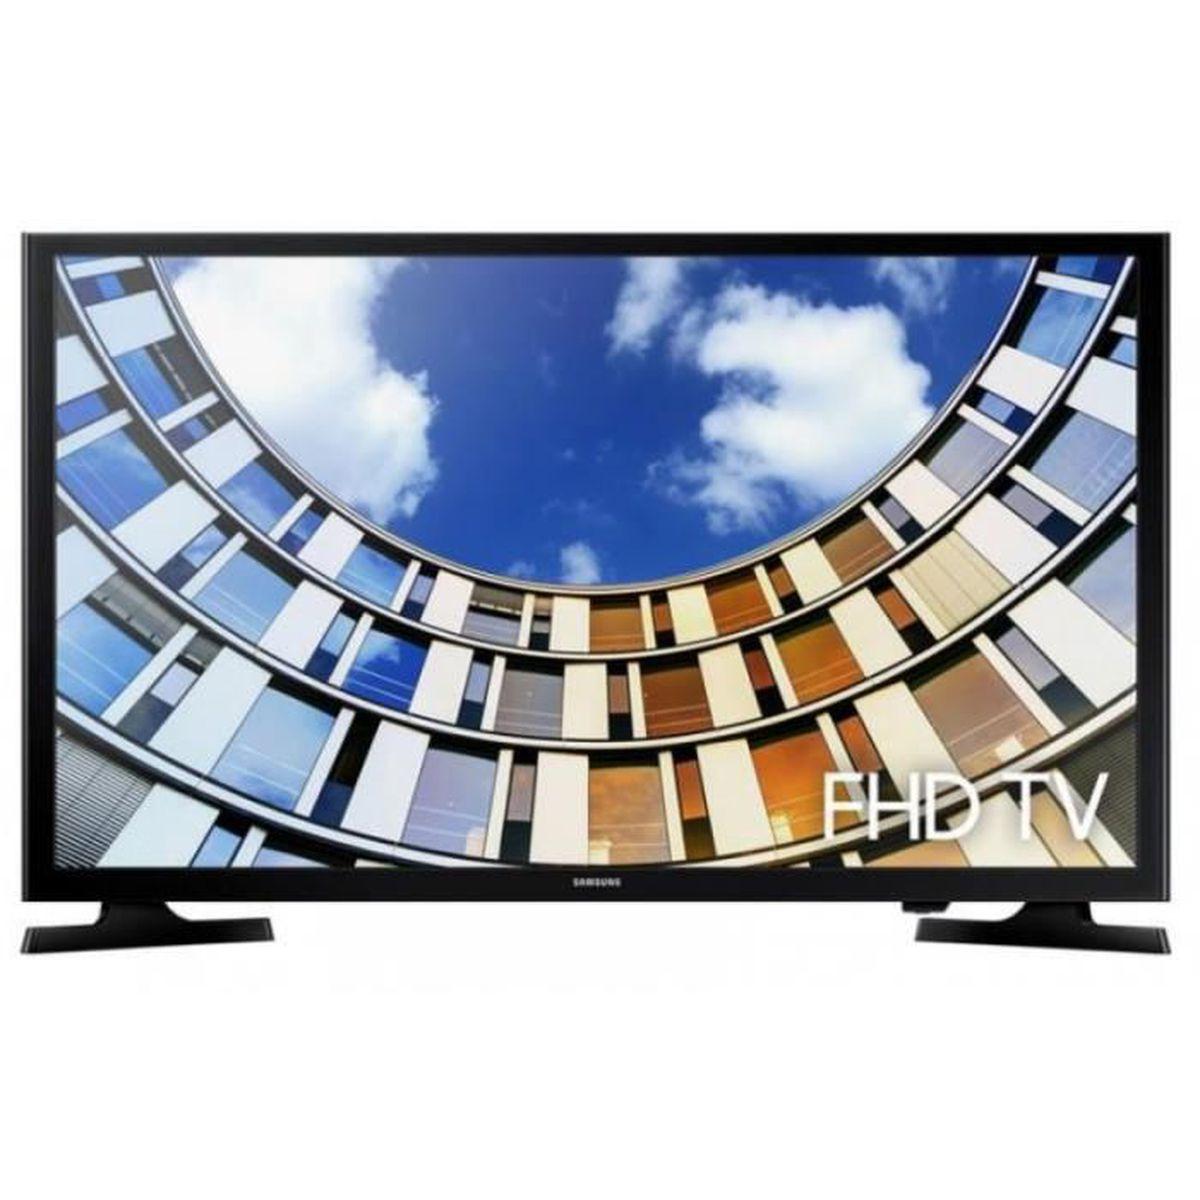 7e7ecec12bcb99 Samsung Téléviseur LED 80 cm Full HD. Téléviseur LED Samsung Téléviseur LED  ...